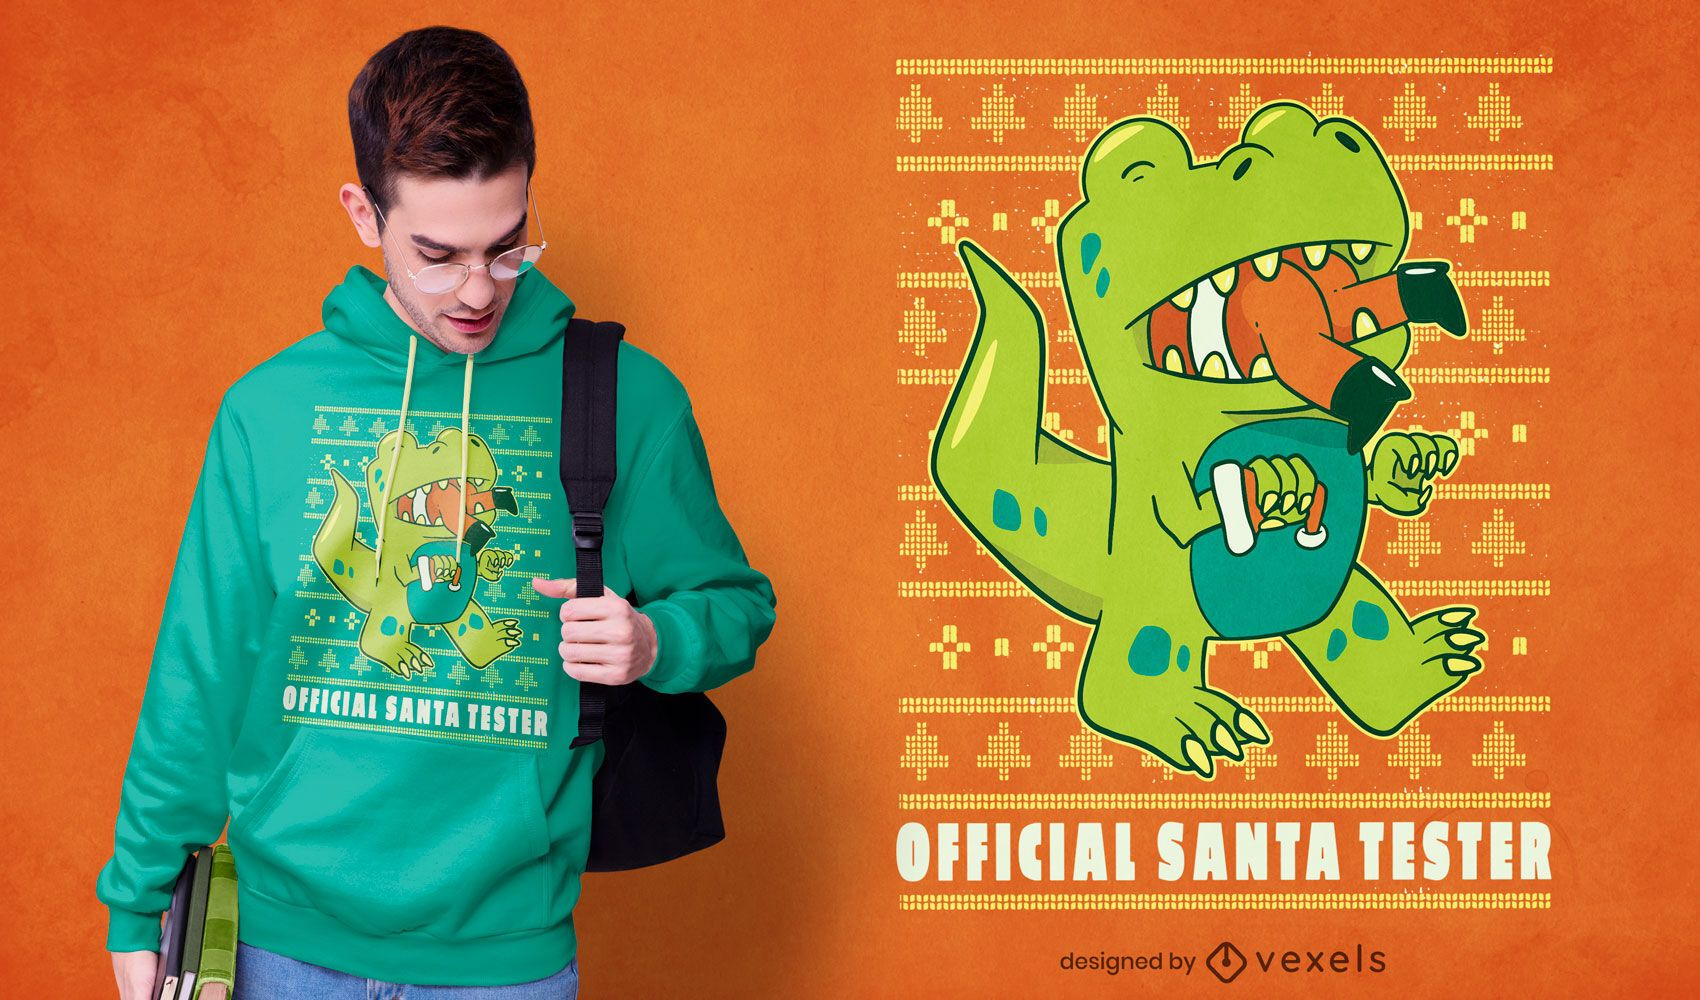 Official santa tester t-shirt design